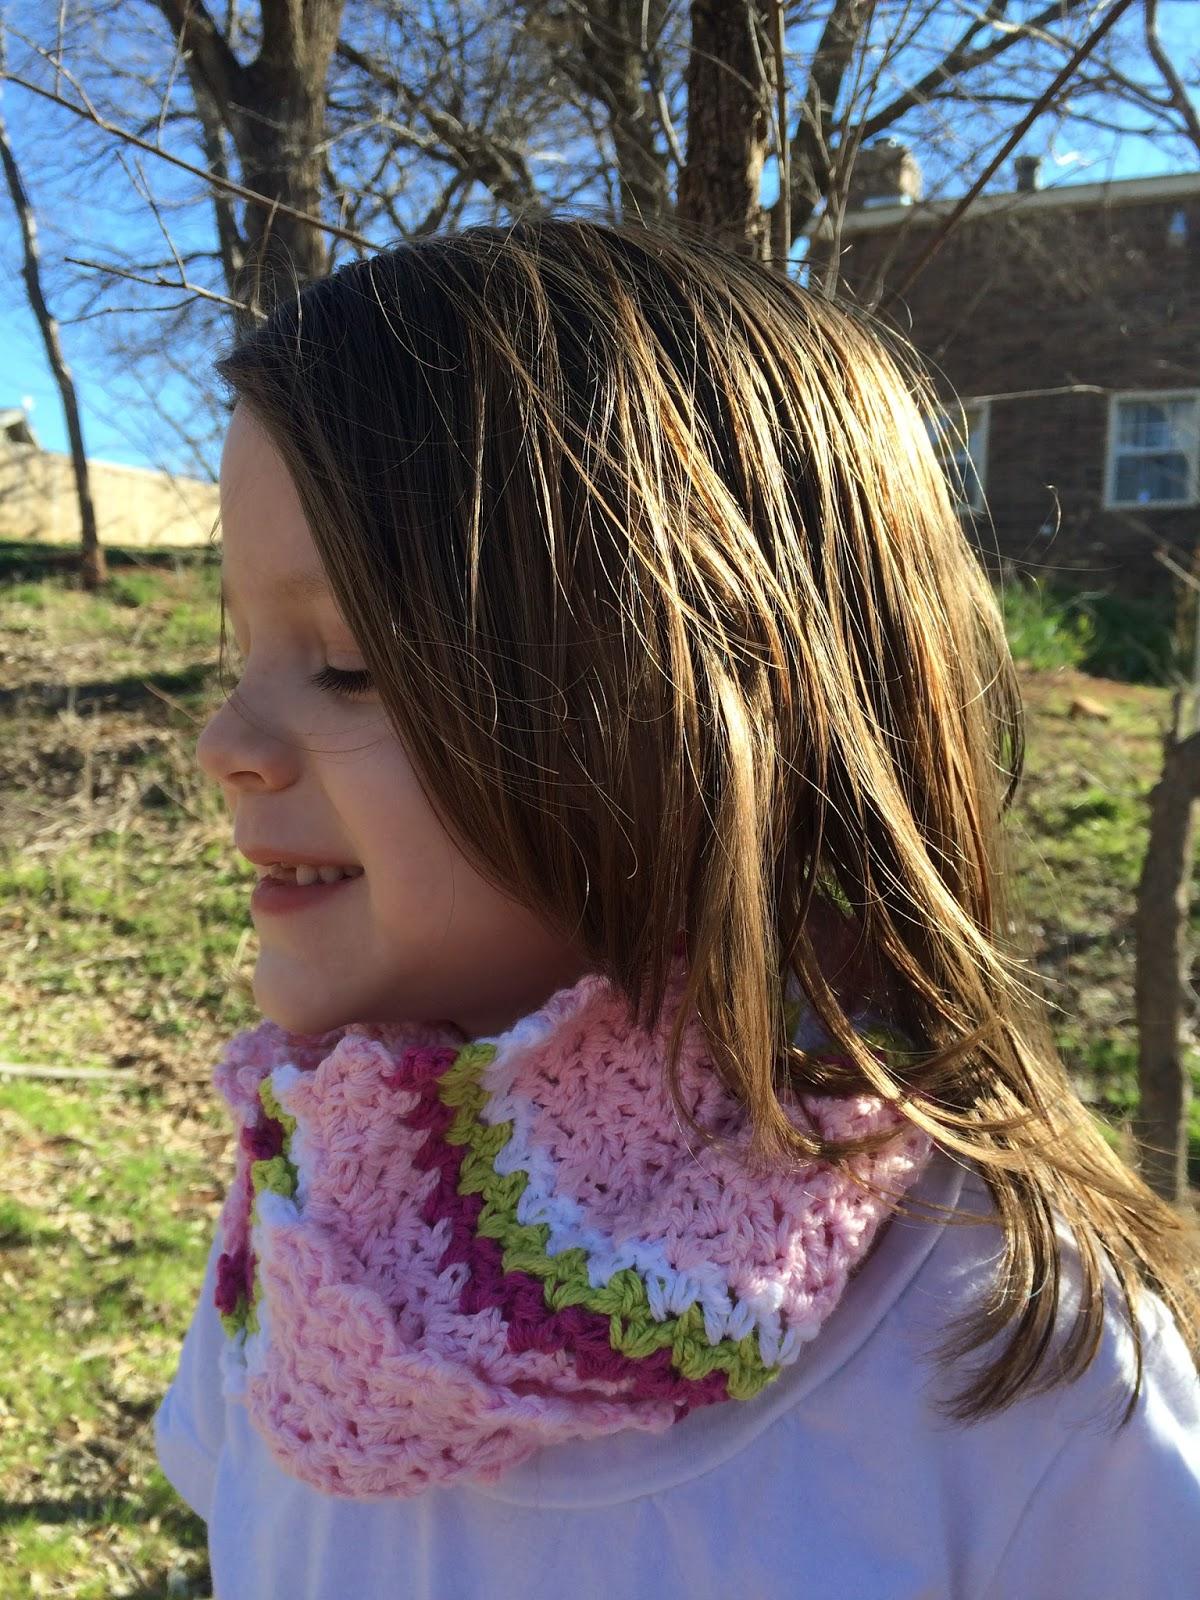 Free crochet pattern for an infinity scarf, pattern by April Garwood of Banana Moon Studio